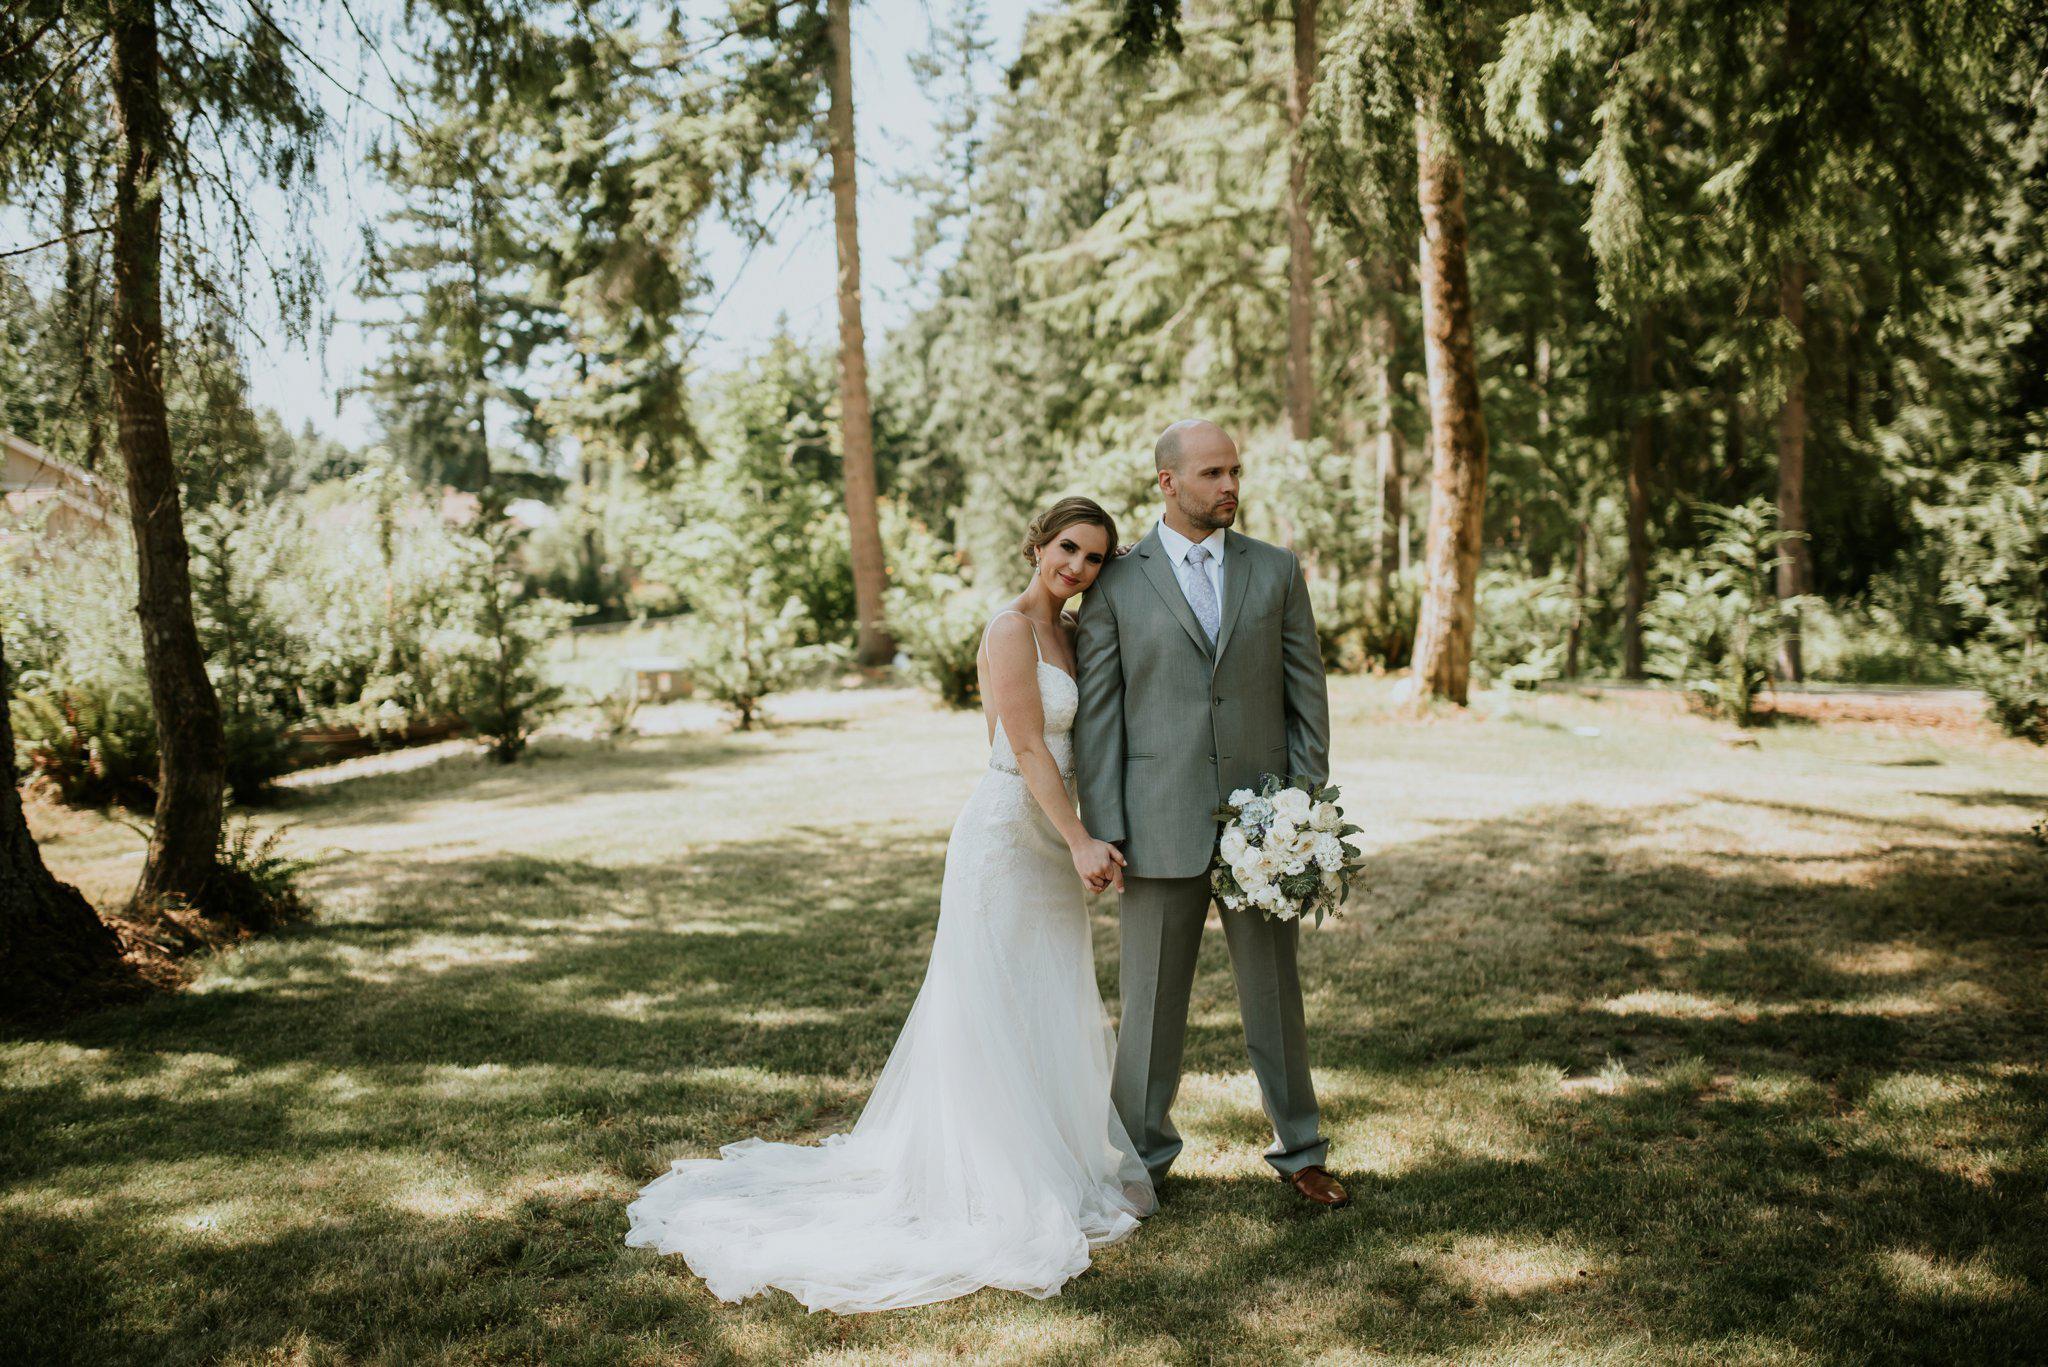 hollywood-school-house-wedding-seattle-photographer-caitlyn-nikula-40.jpg